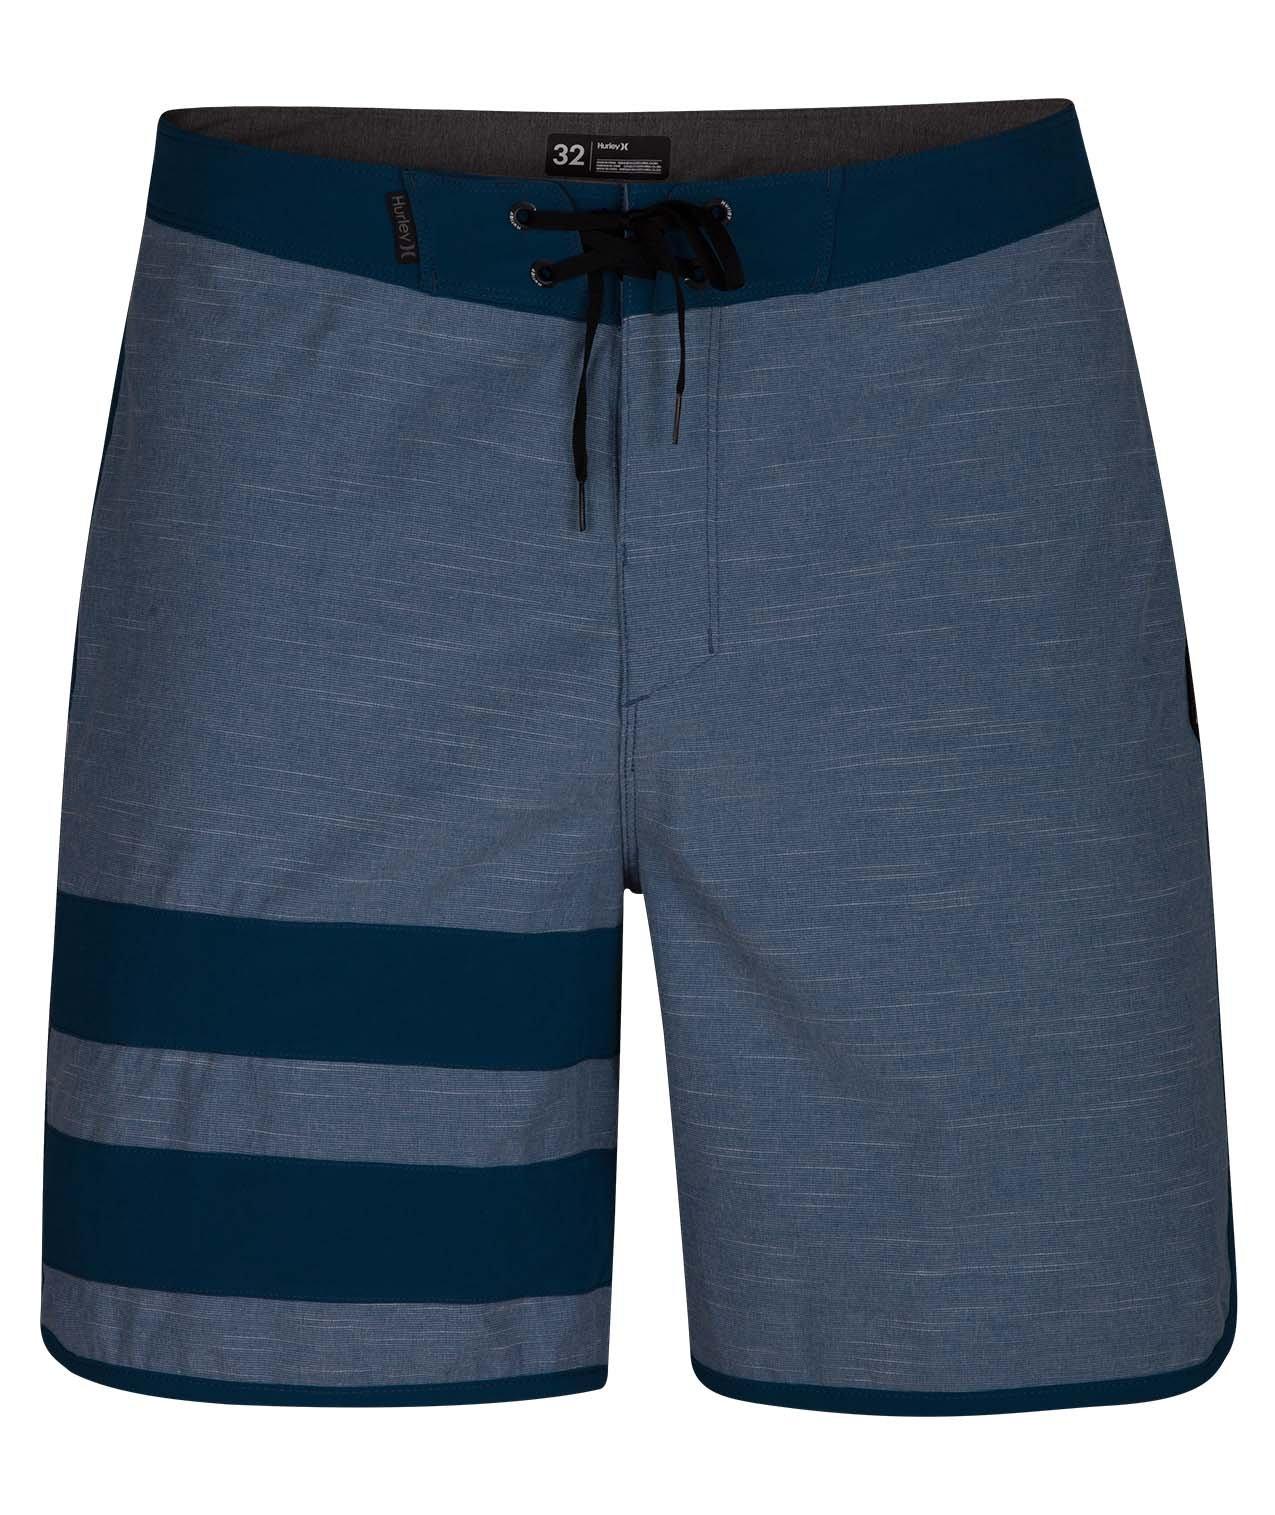 Hurley Men's Phantom Block Party 18'' Swim Short Boardshort, Blue Force, 32